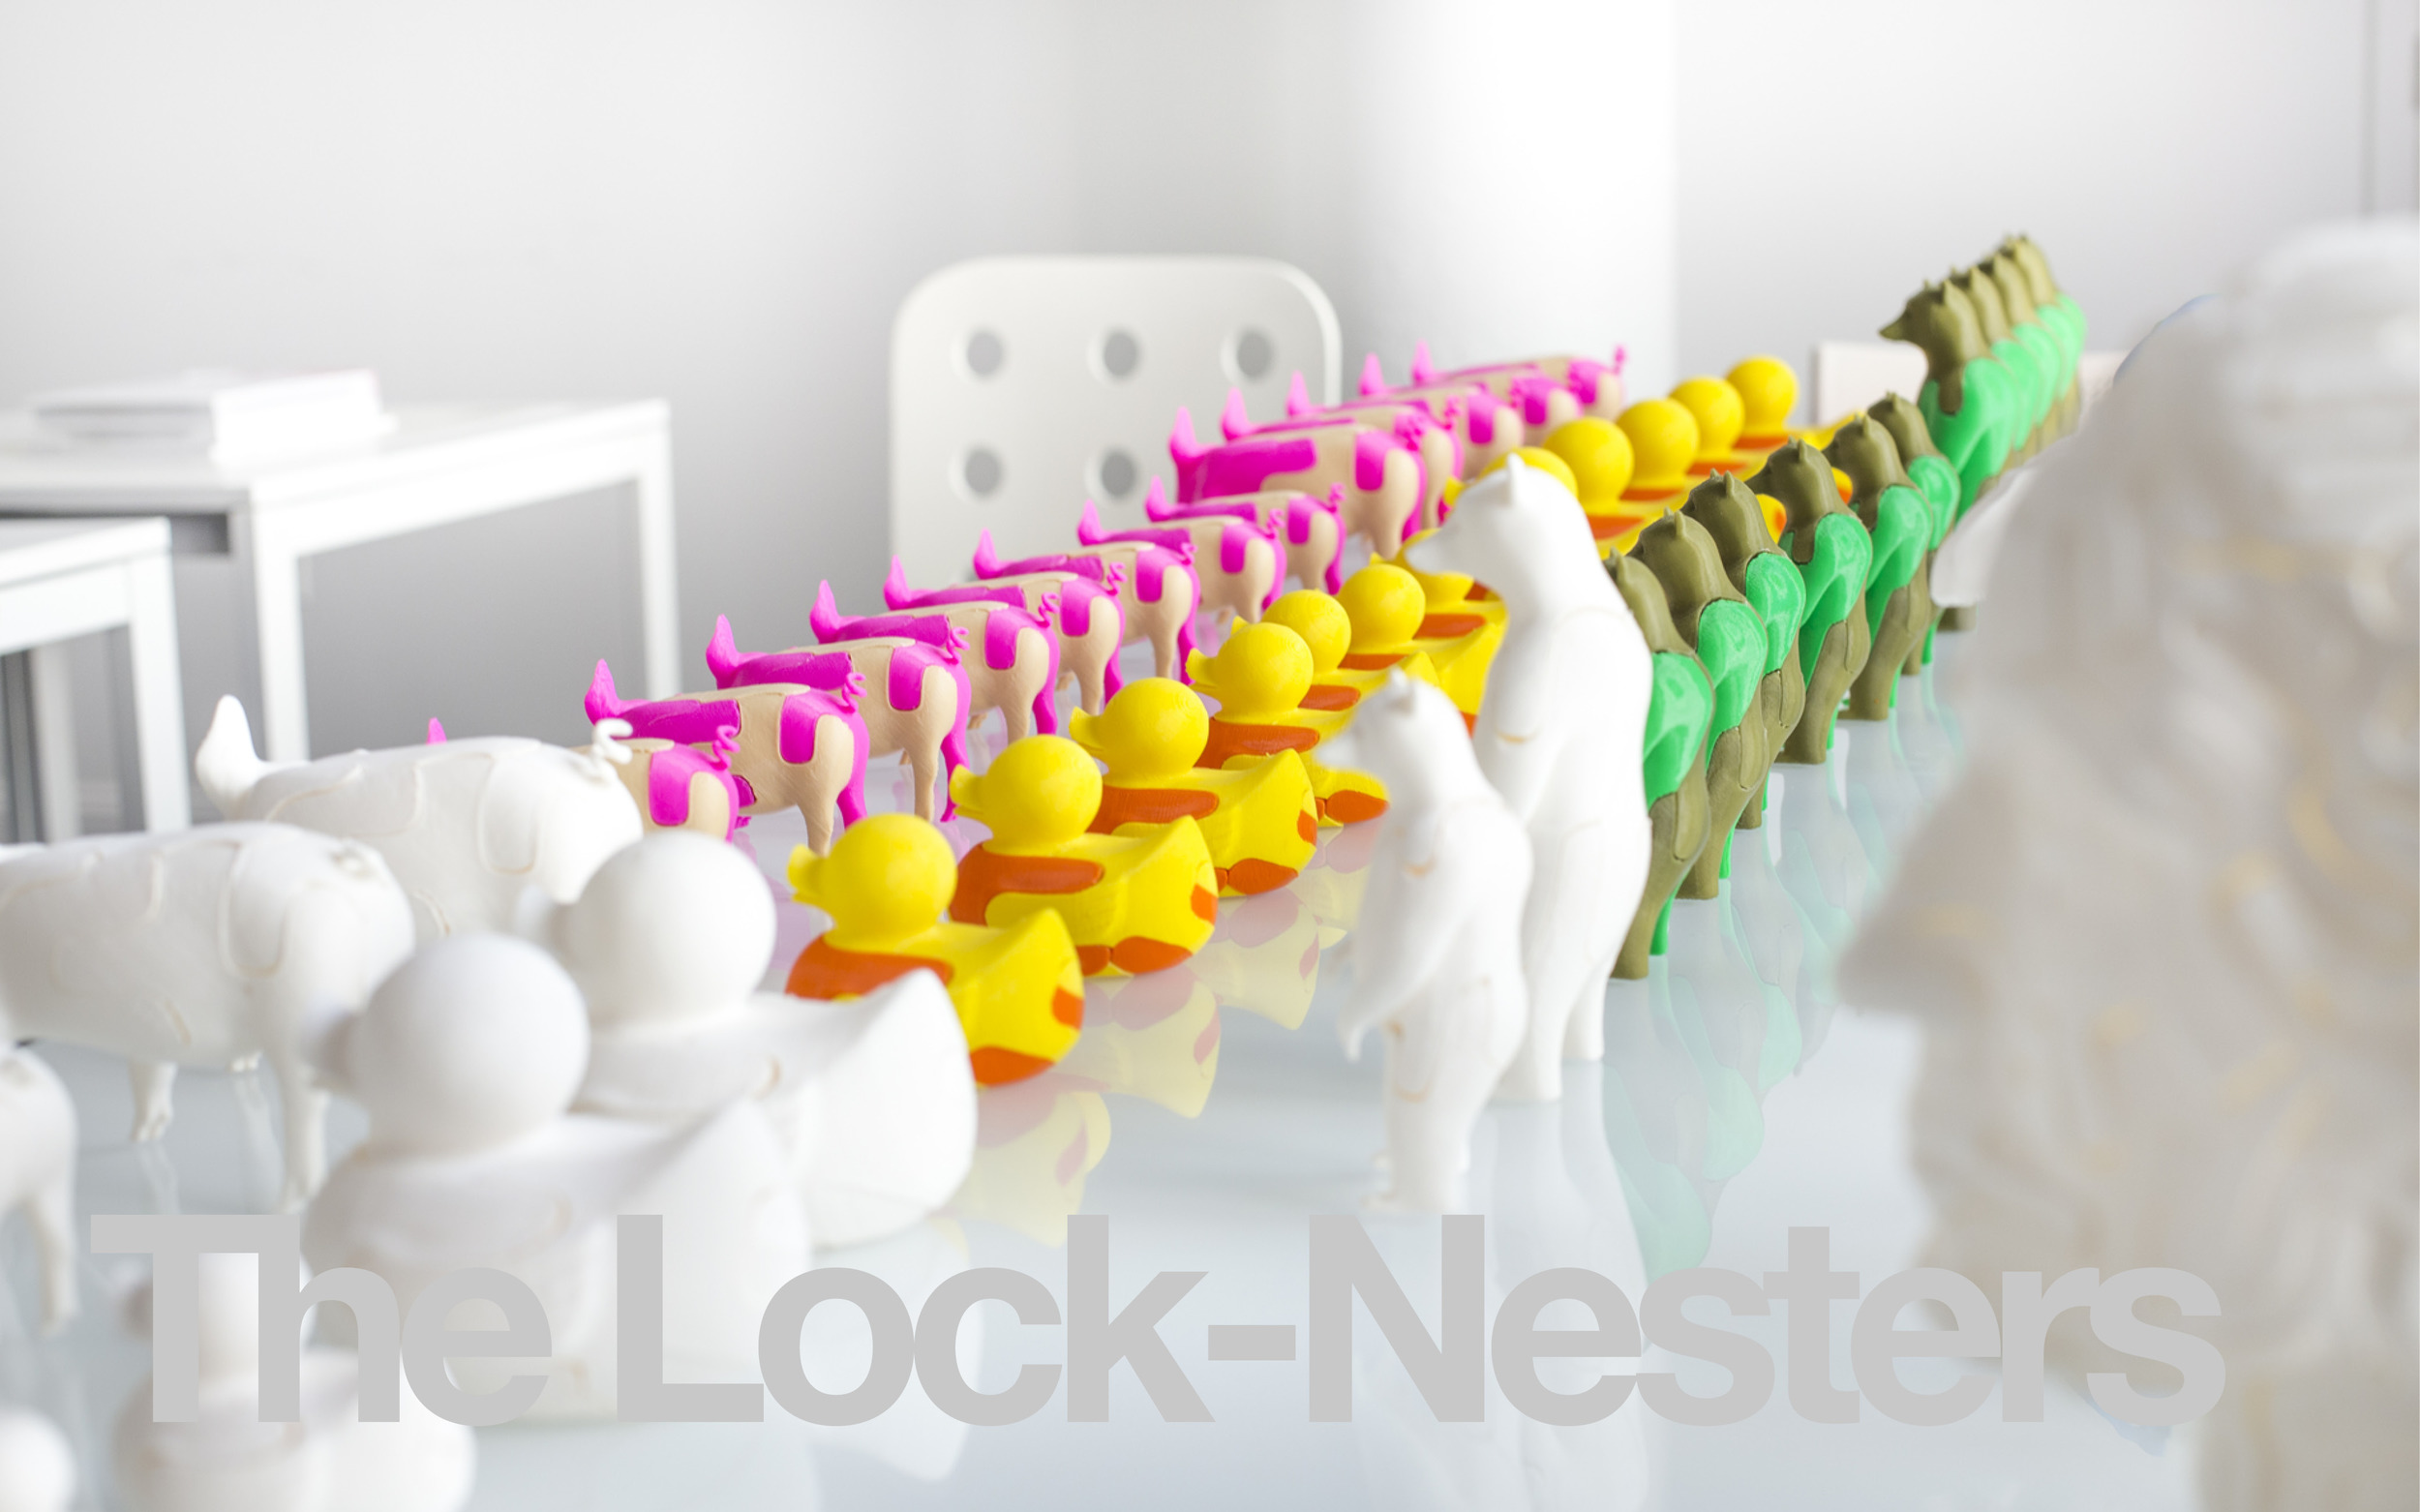 lock-nesters2.jpg